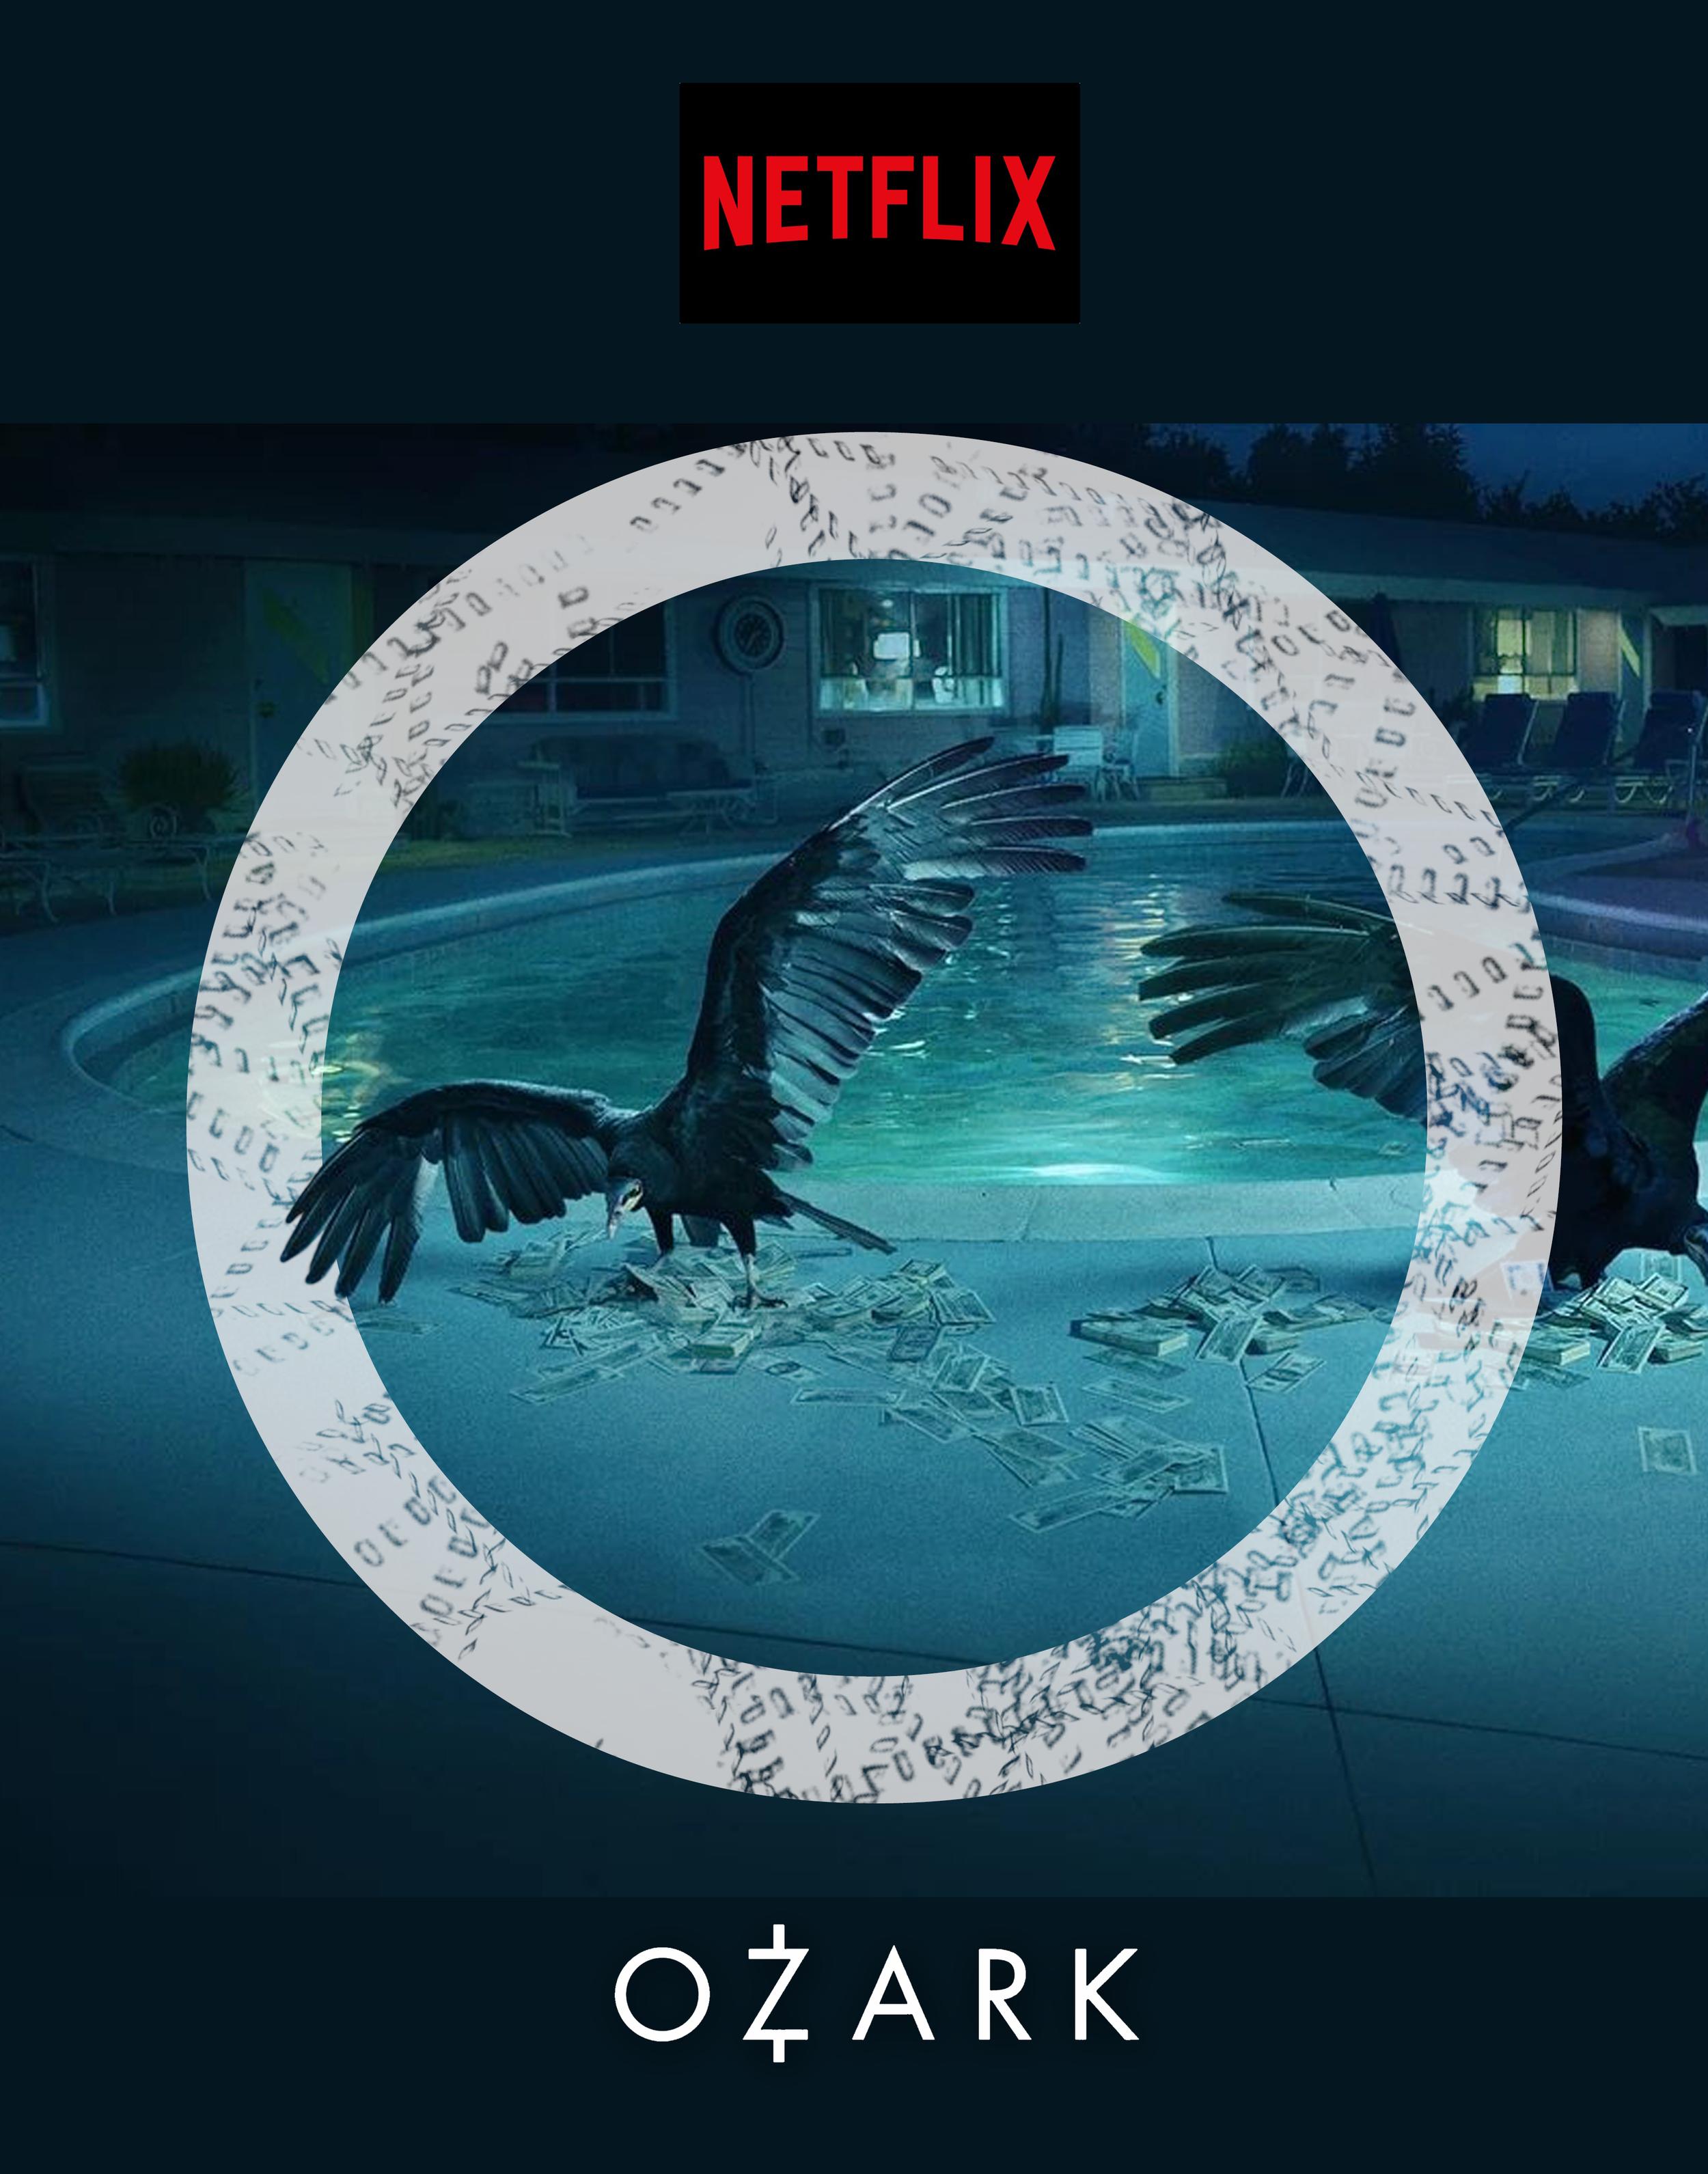 Netflix_Ozark.png